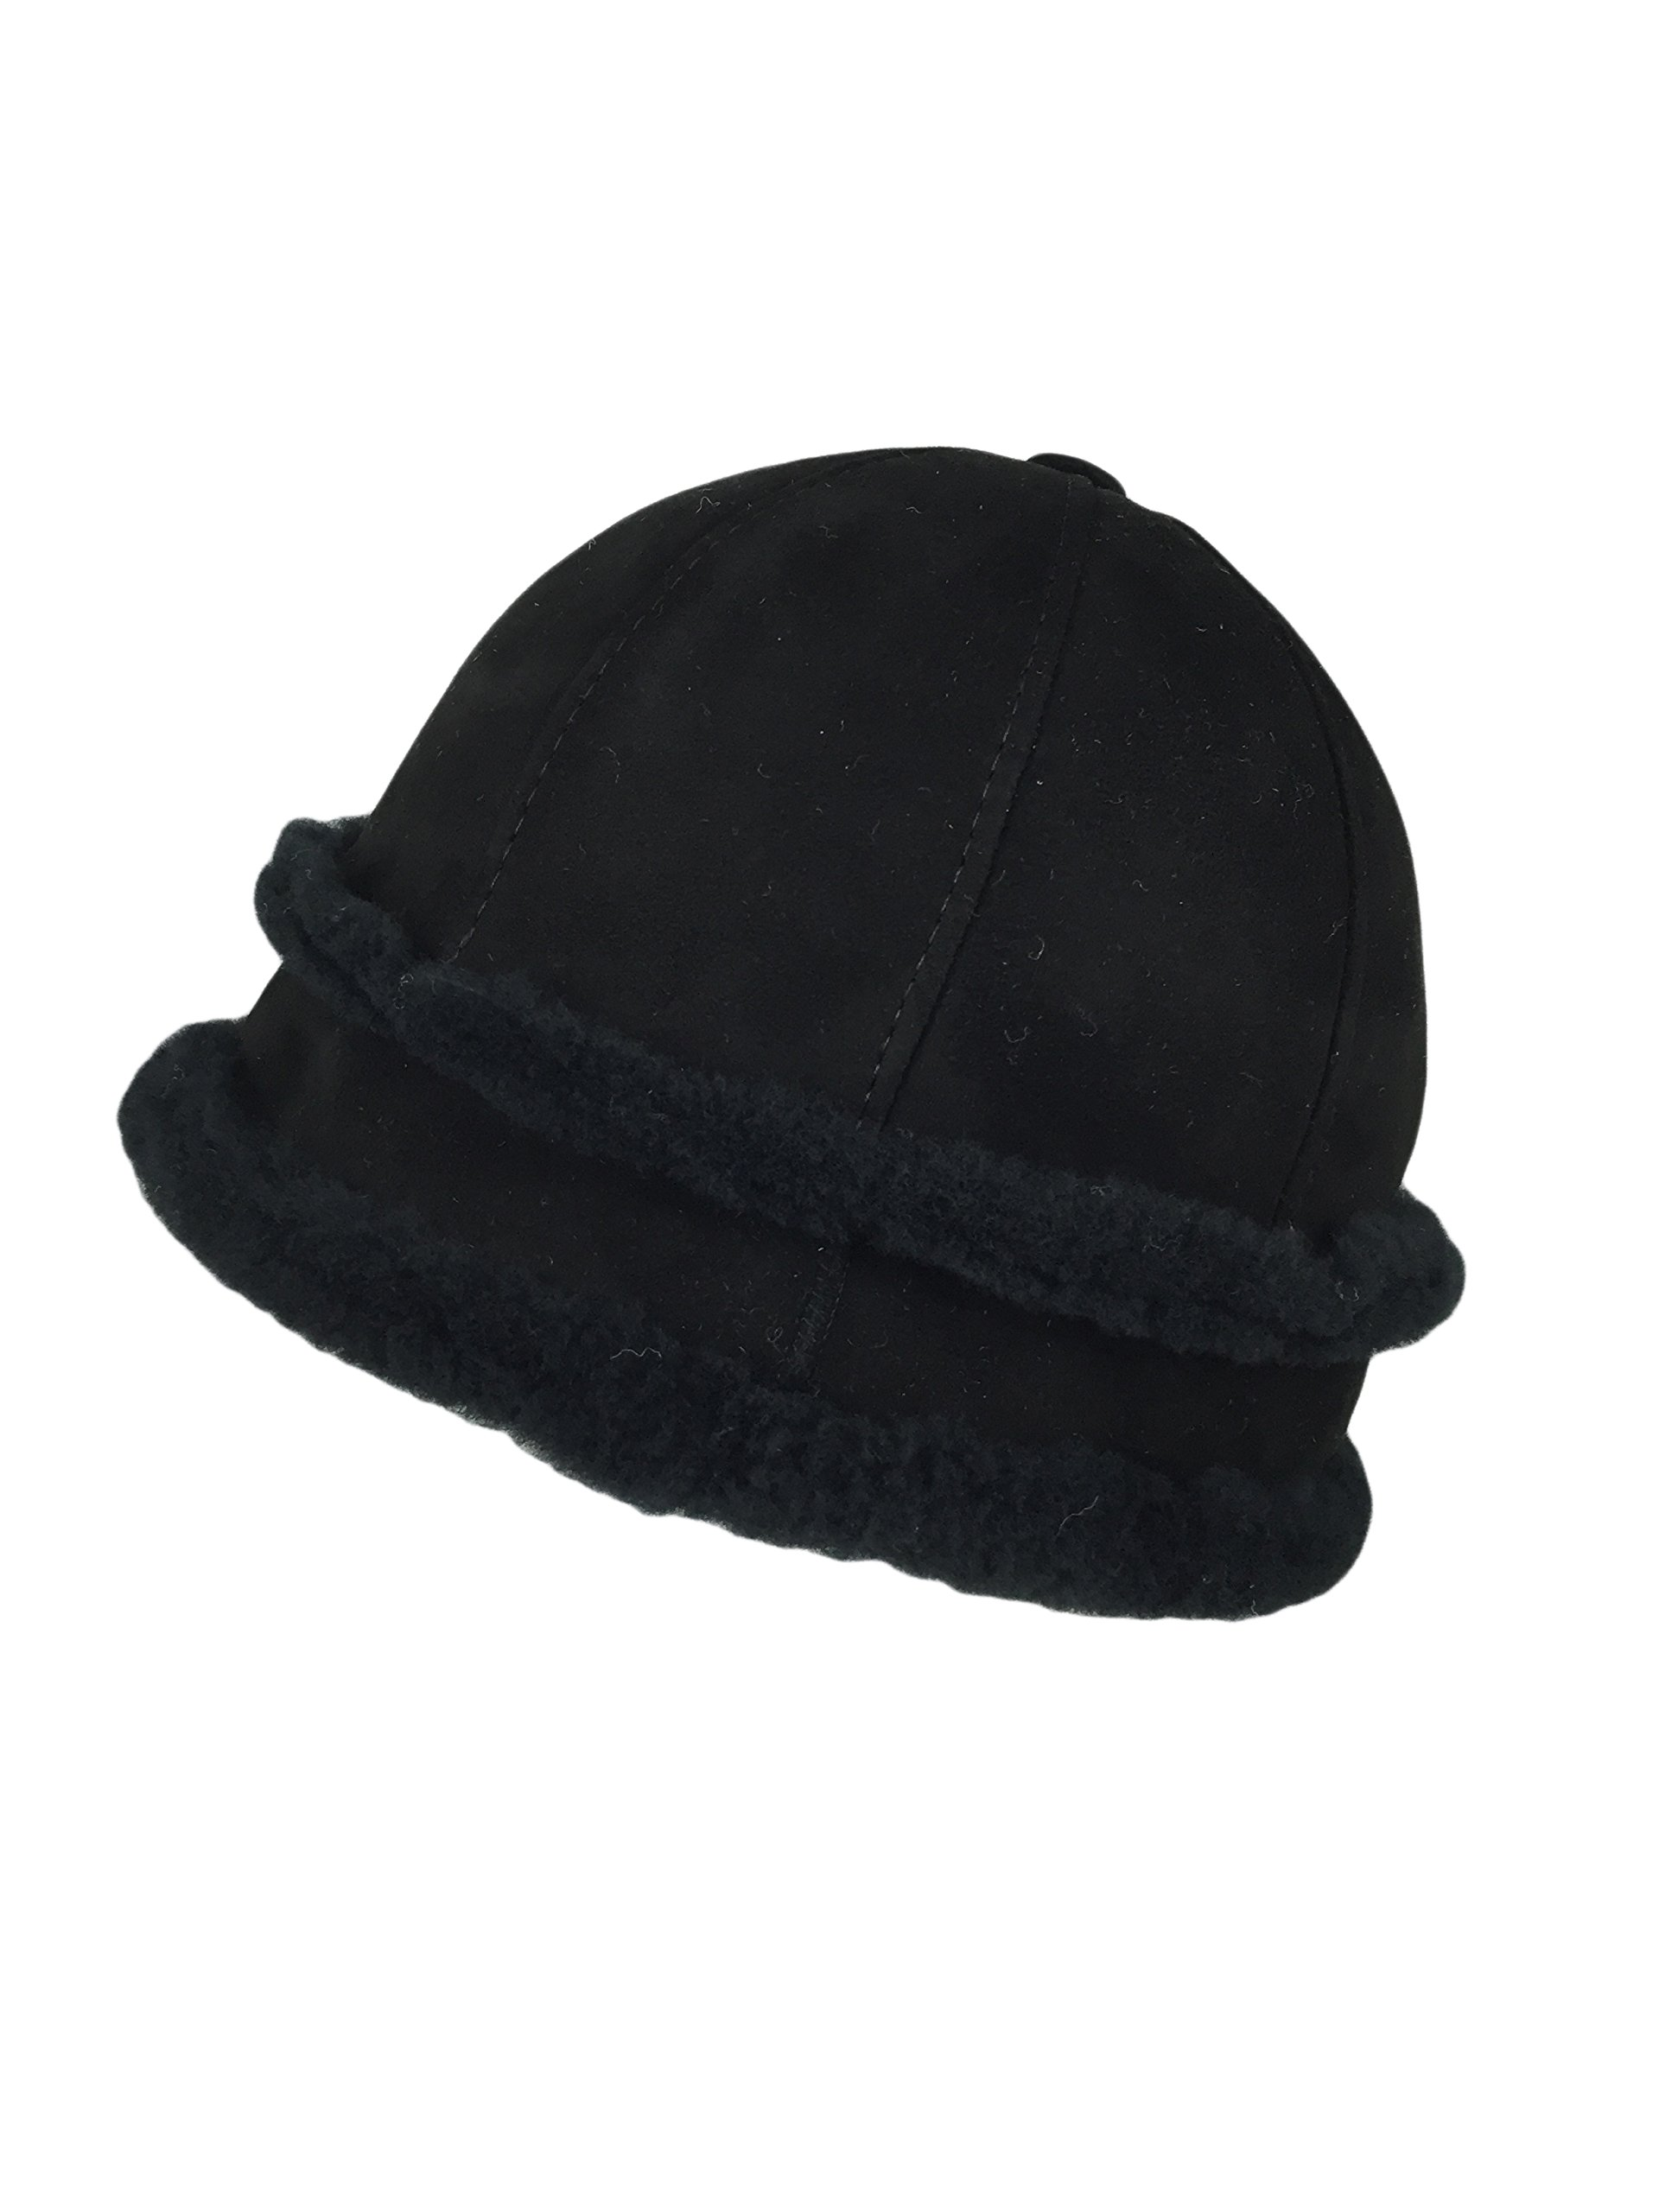 Zavelio Women's Shearling Sheepskin Winter Fur Bucket Beanie Hat Black Suede XXL